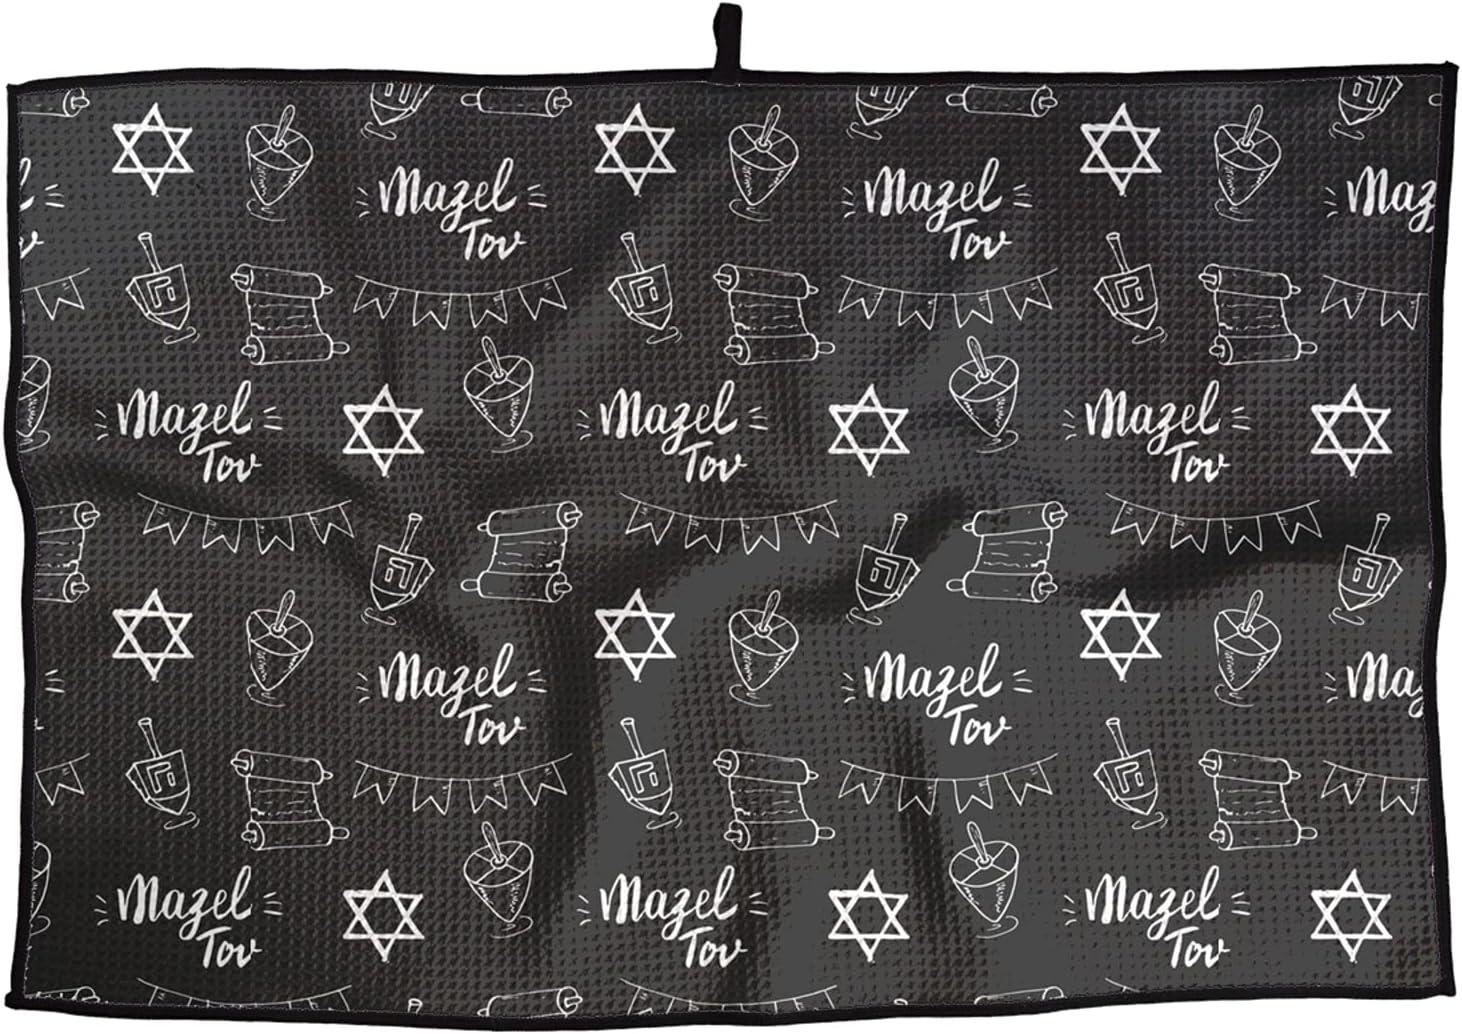 Soft Weekly update Superfine Golf Towel favorite Mazel Portabl Quick-Drying Pattern tov